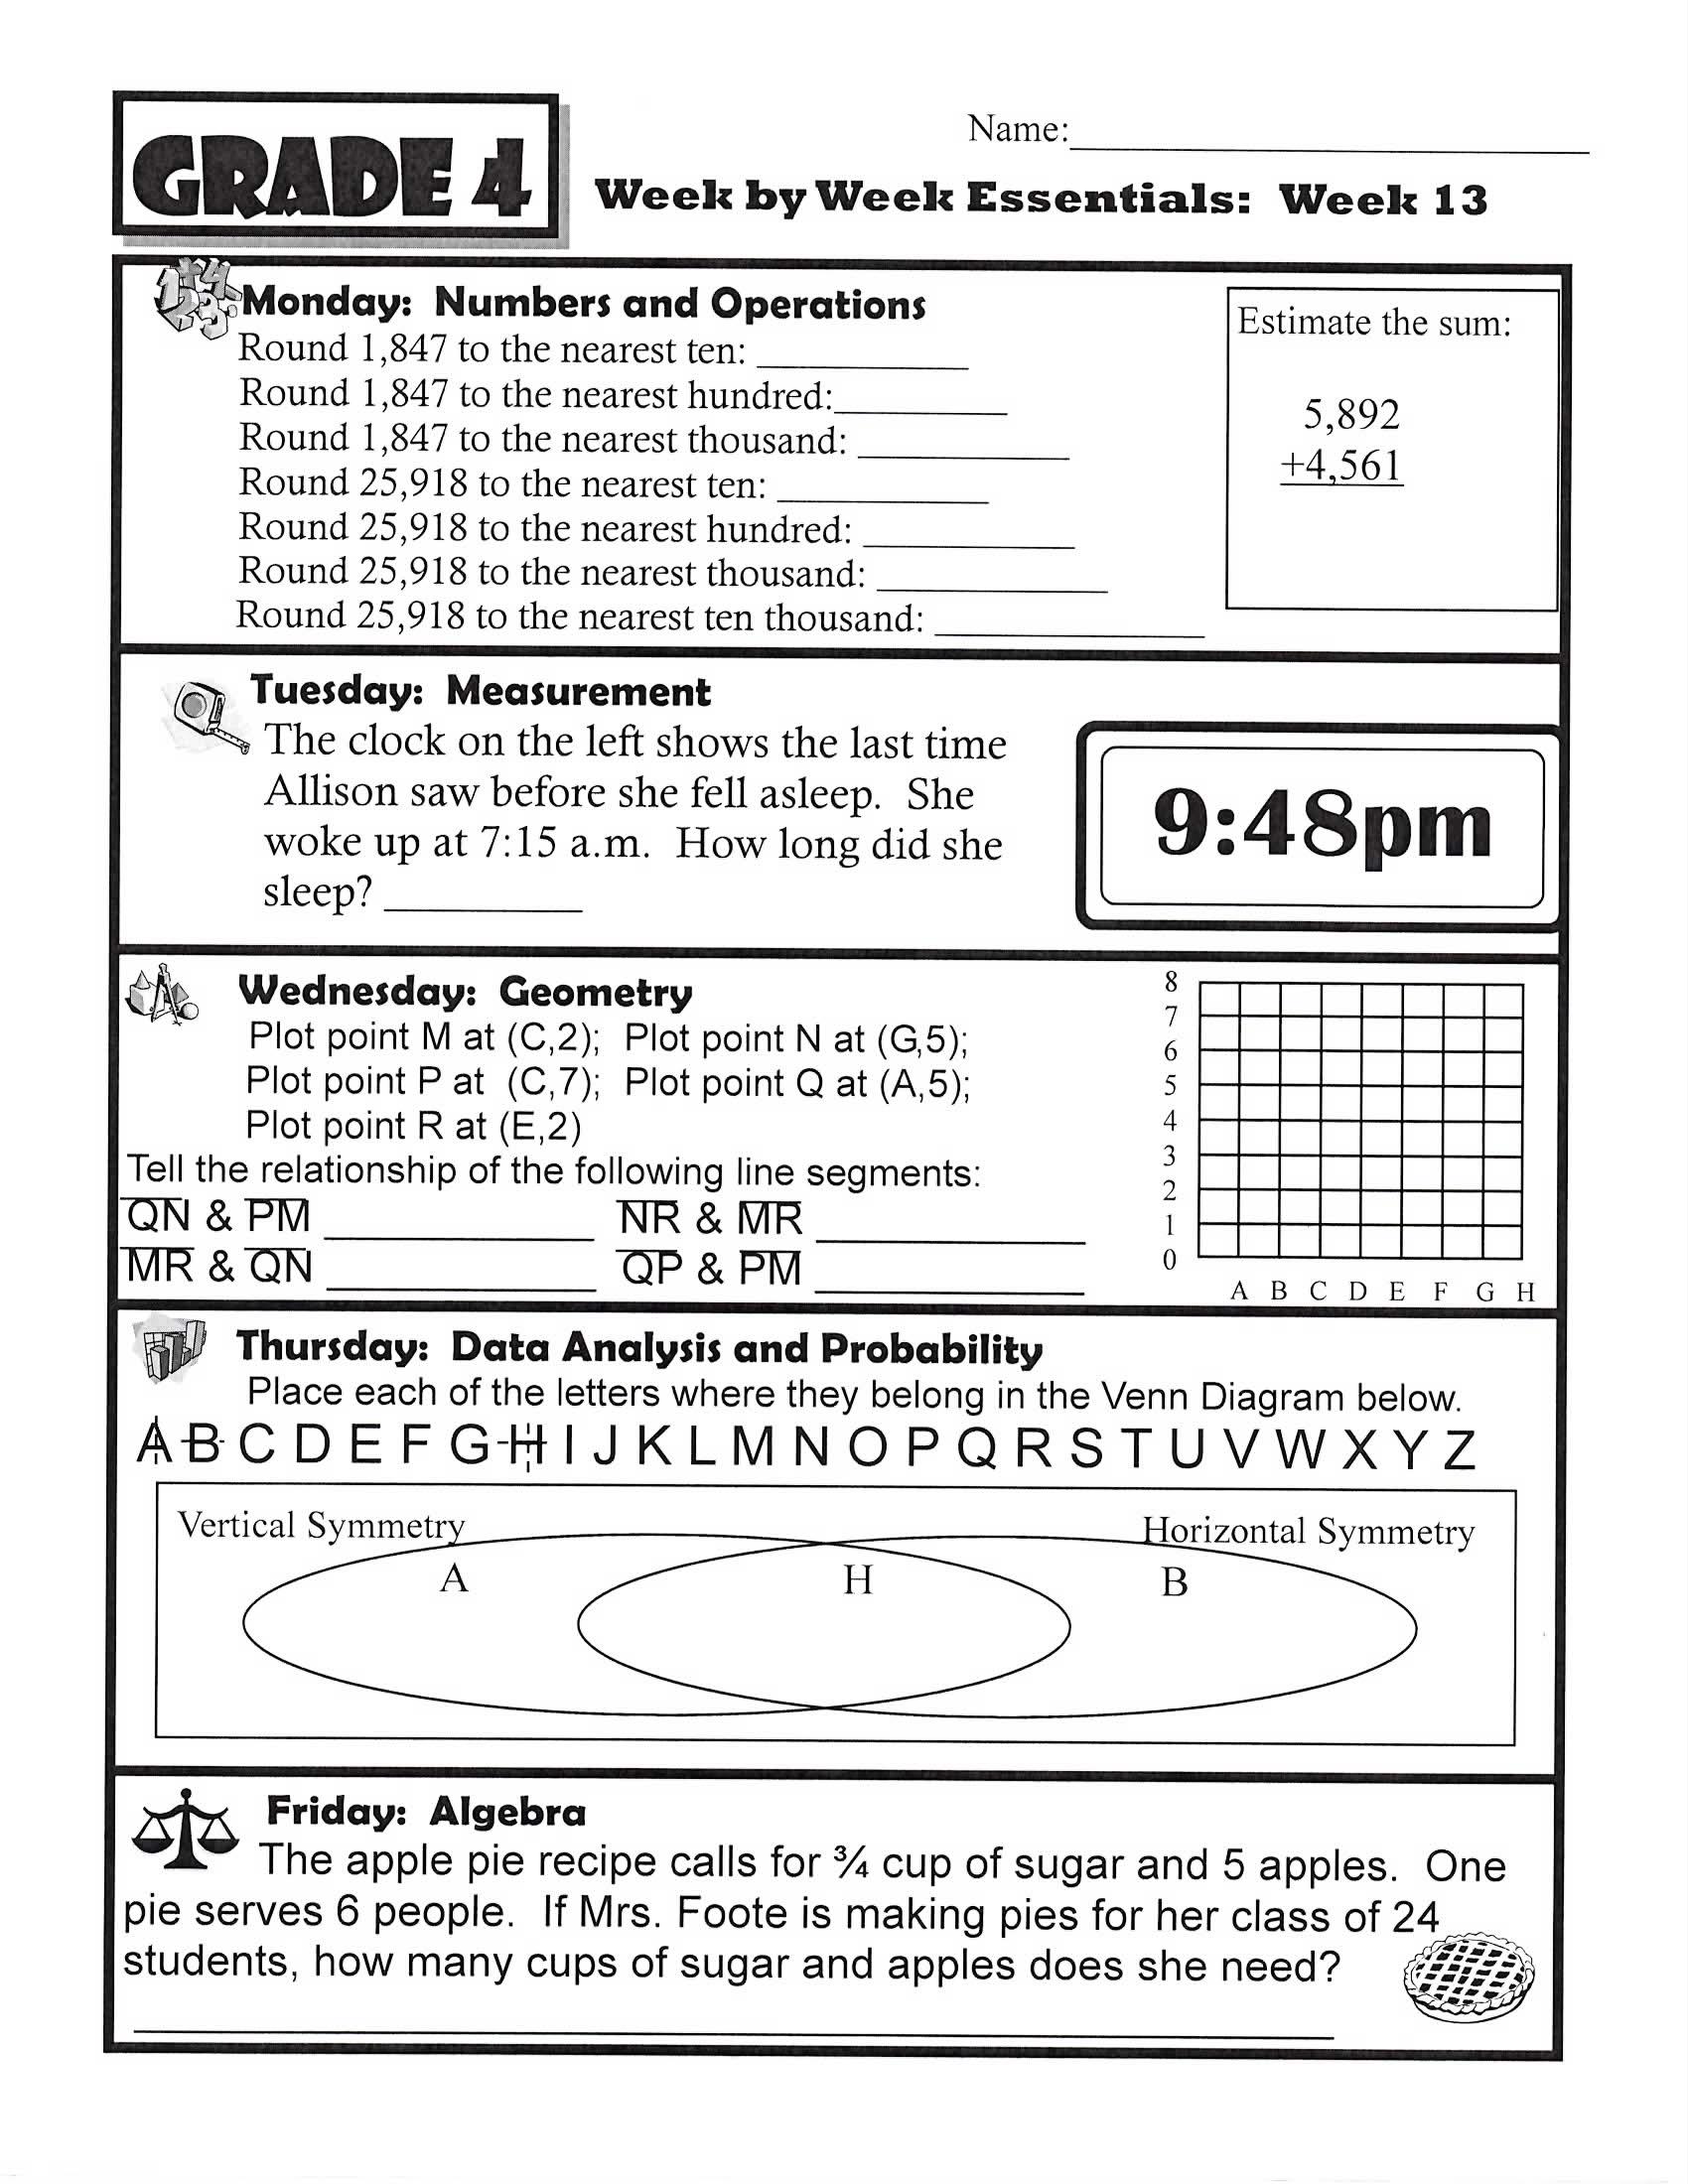 hight resolution of Homework Help For Grade 7-10 Math Students! 7th Grade Math Homework Help